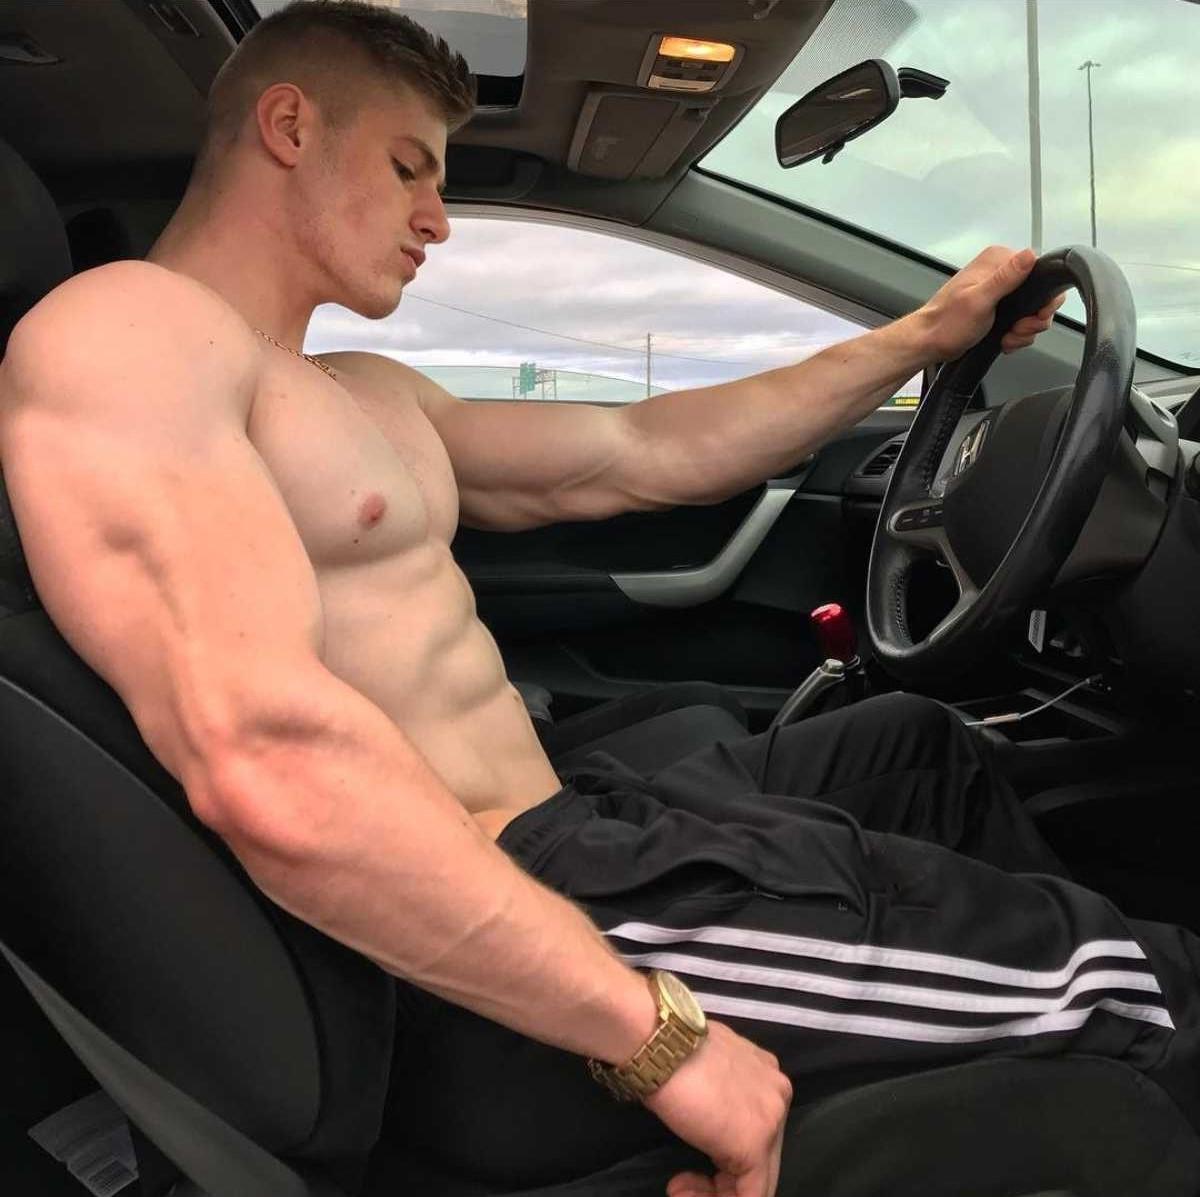 cocky-beefy-shirtless-dudes-muscular-bro-driving-car-shirtless-bad-boy-buff-body-huge-biceps